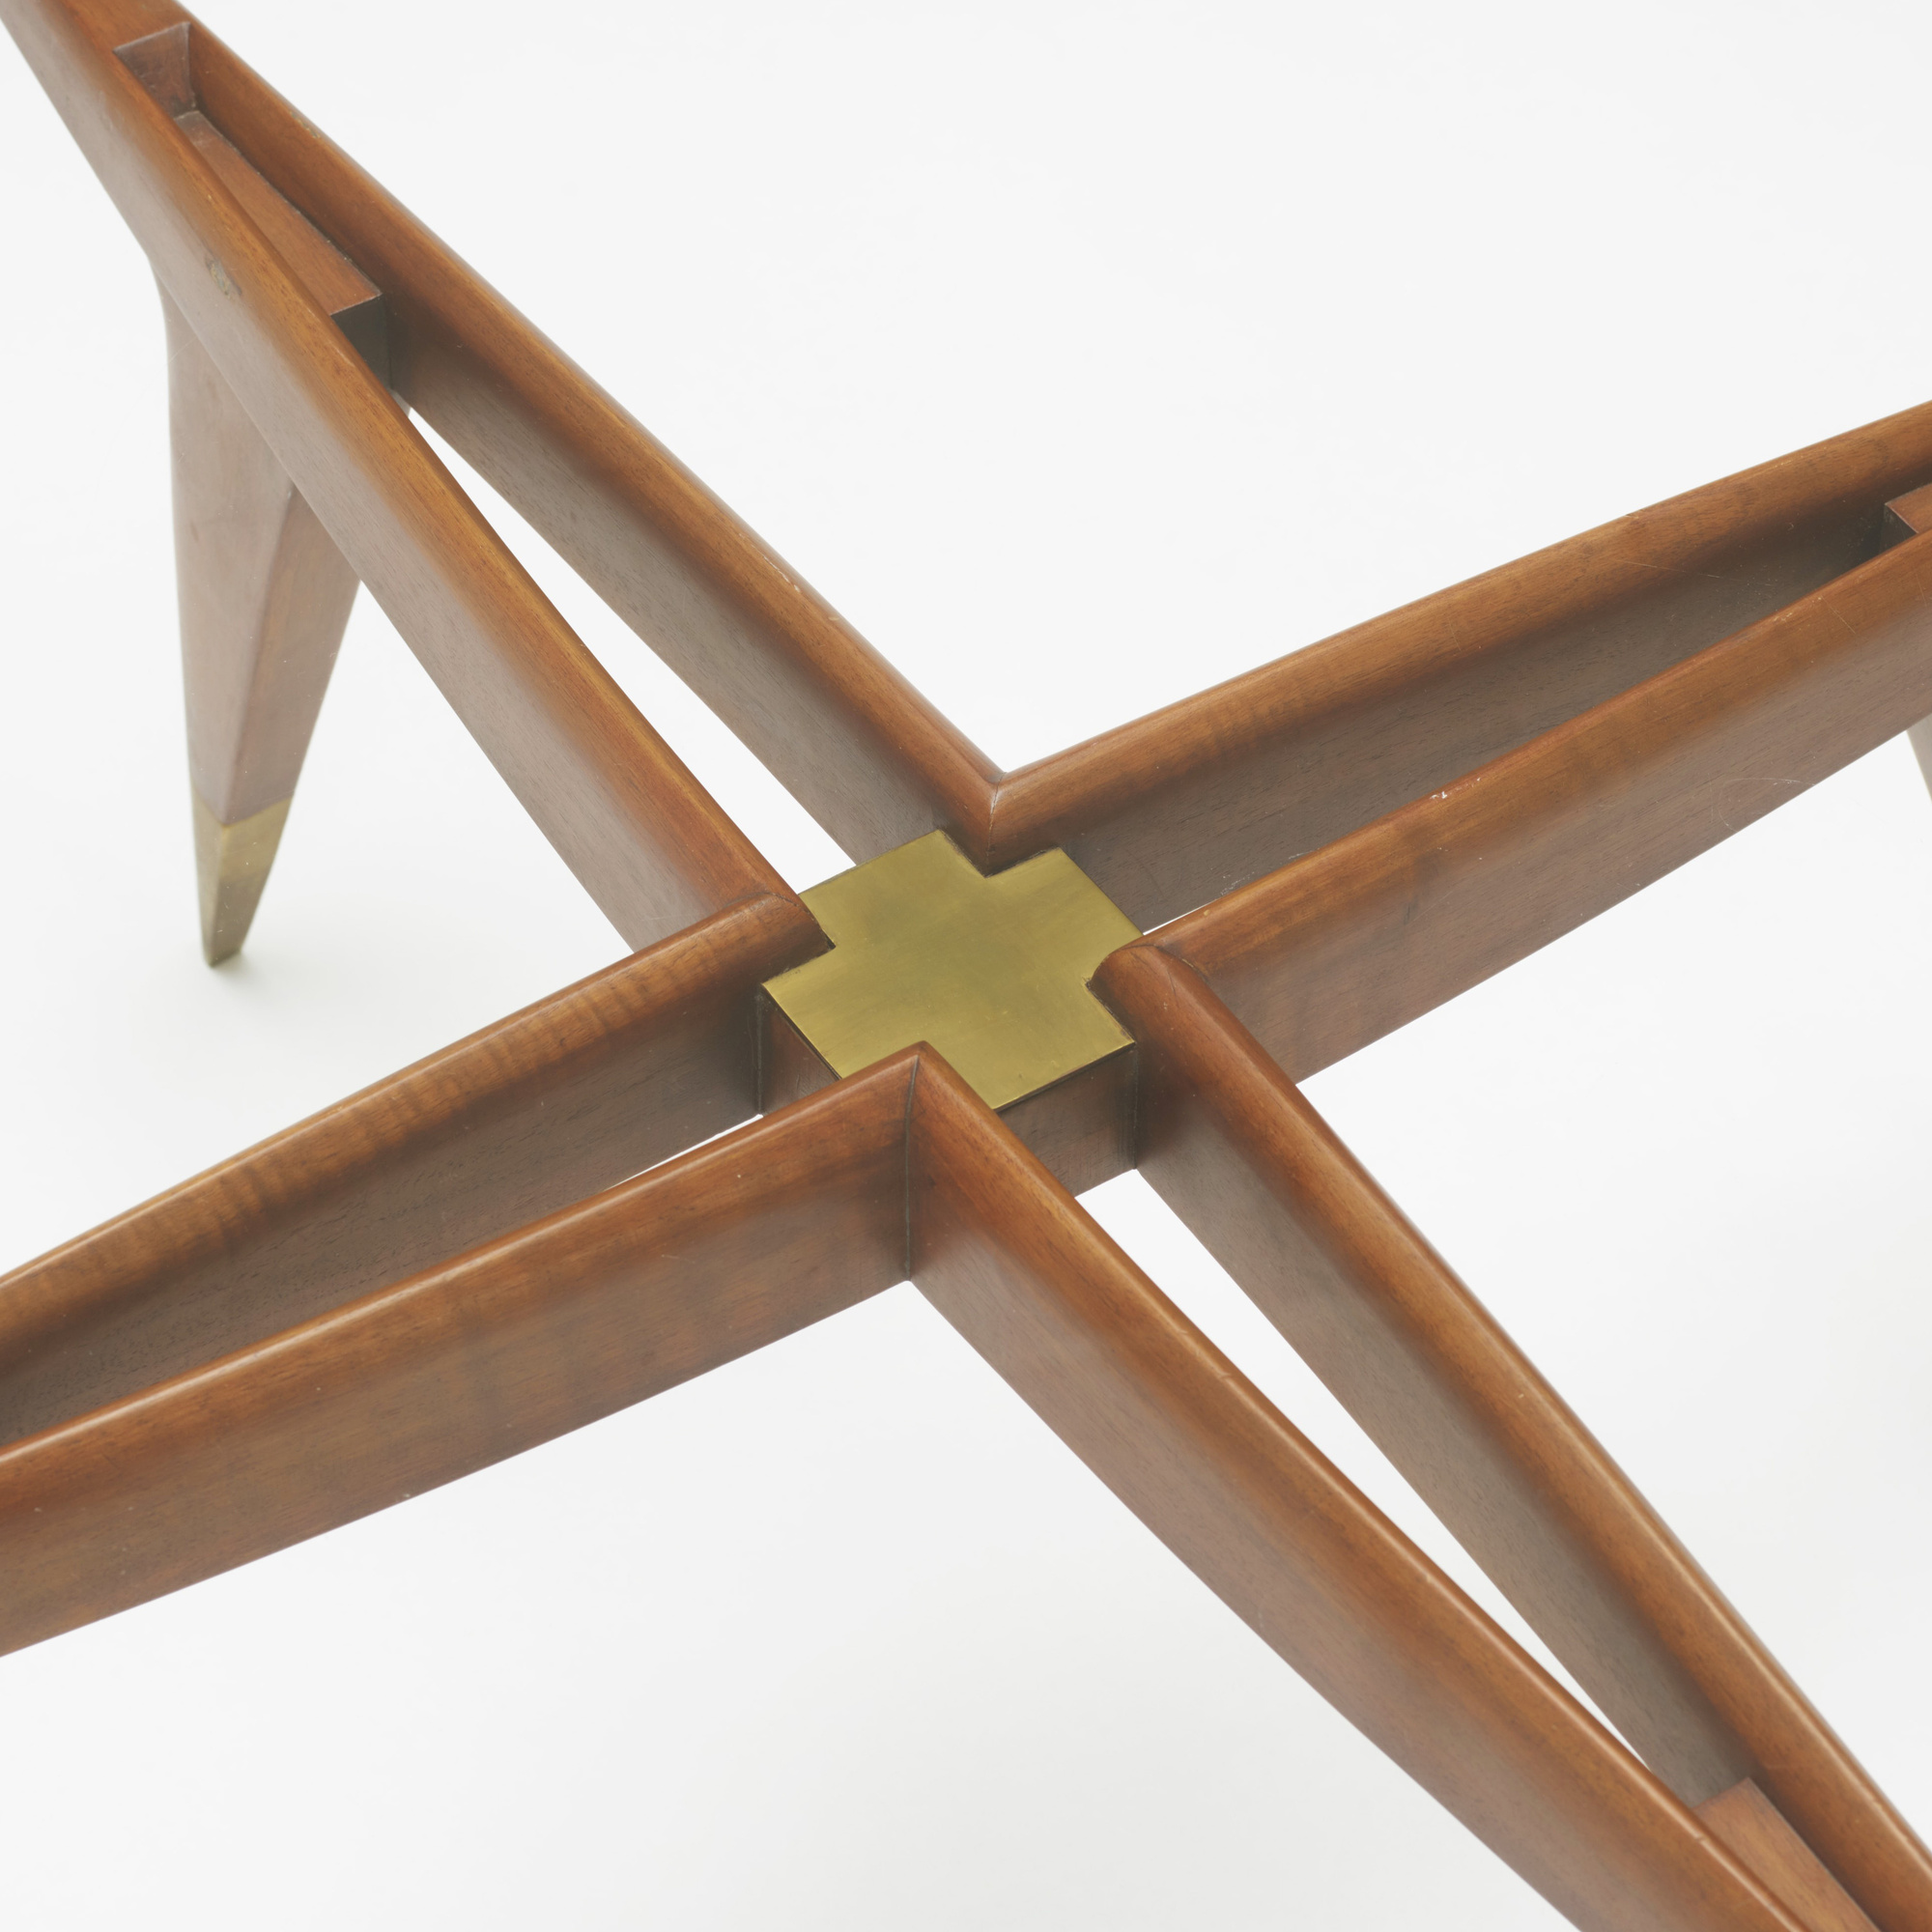 270: Gio Ponti / coffee table (2 of 2)